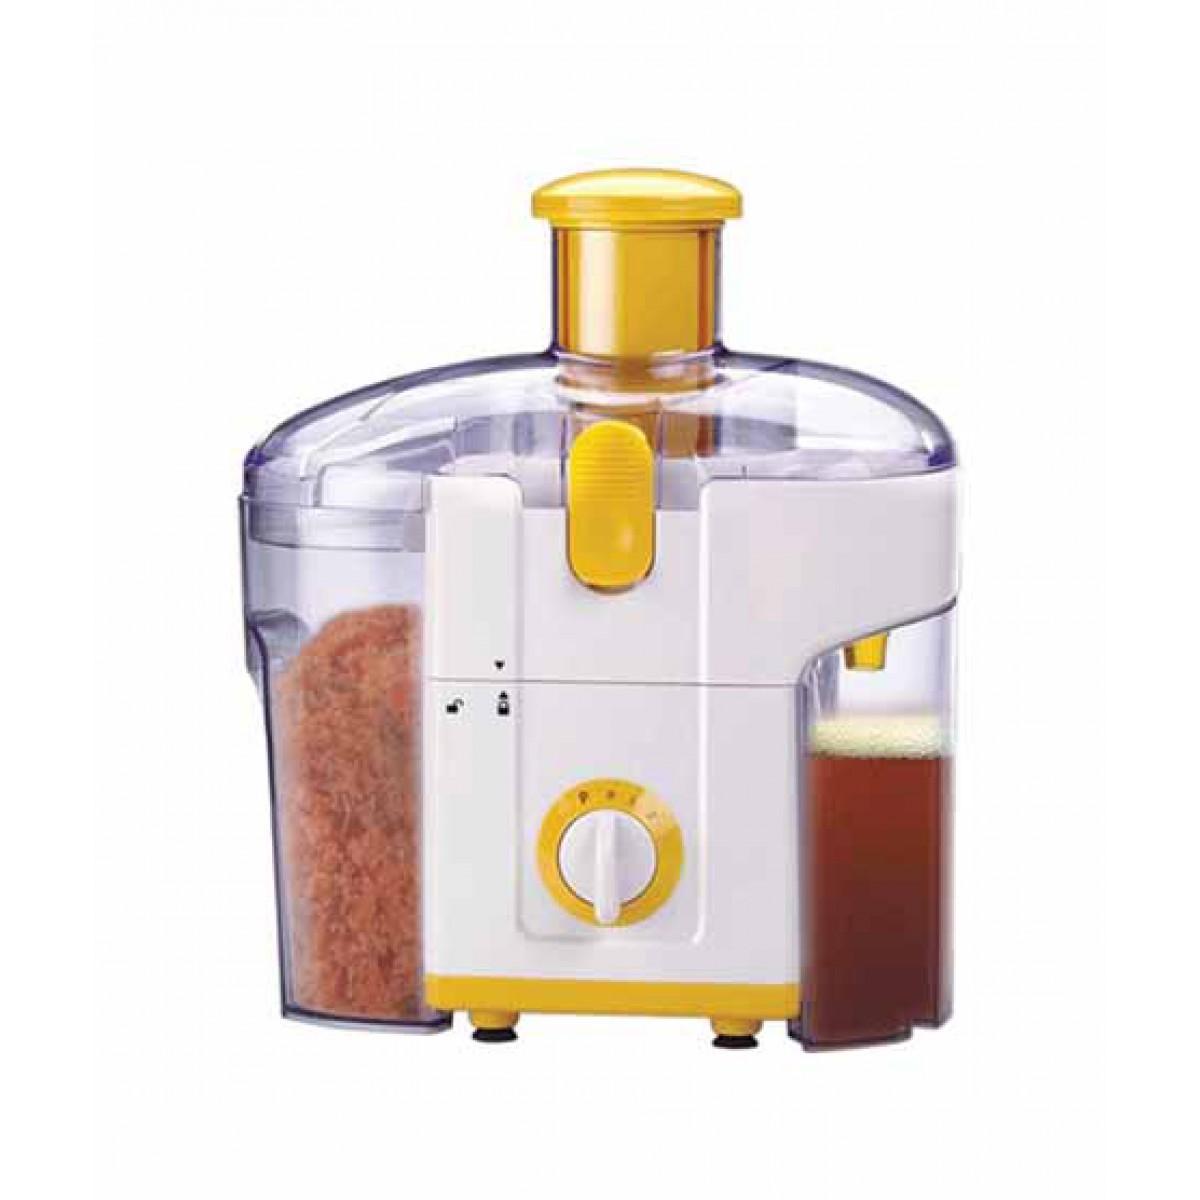 Westpoint Juicers Machine Online In Pakistan Daraz Pk